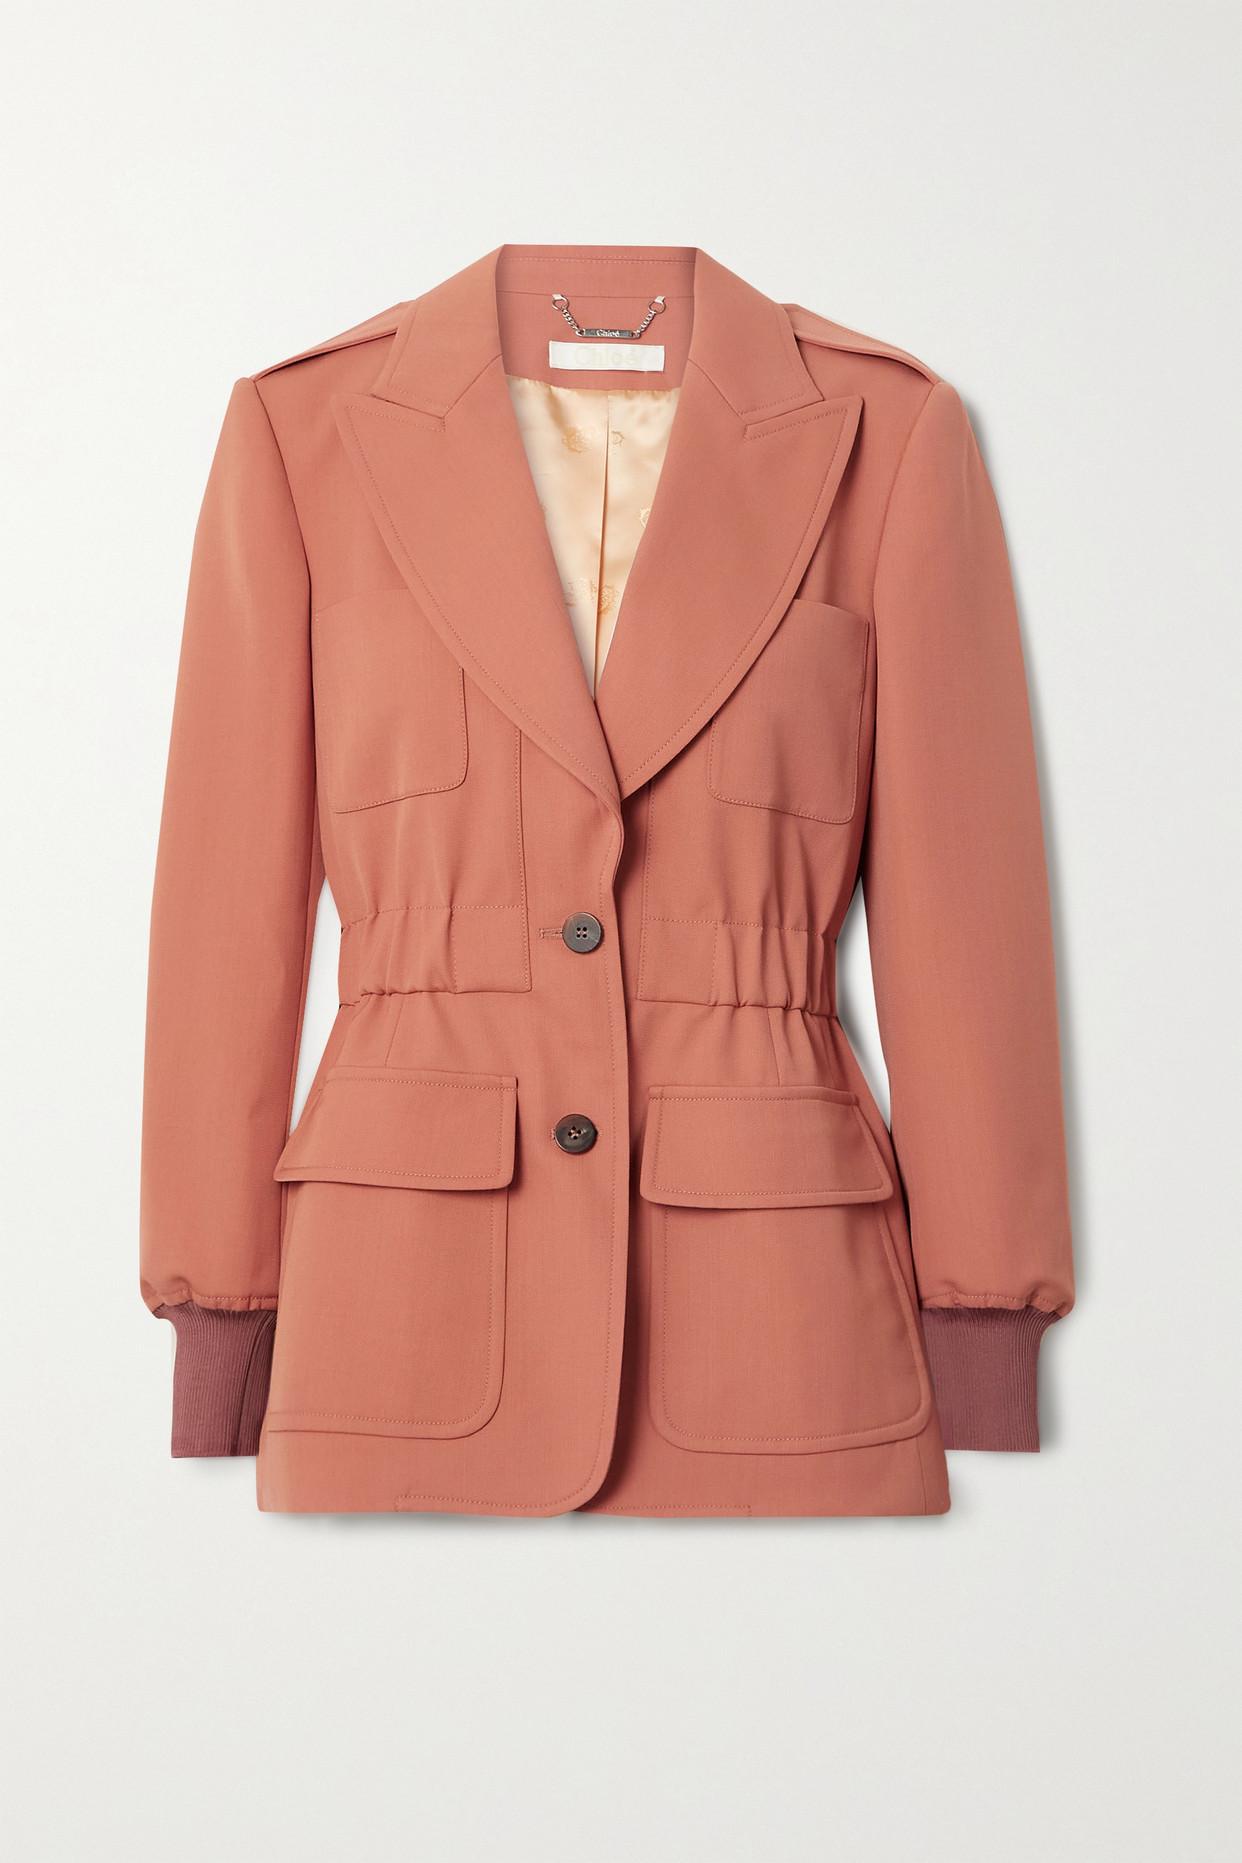 CHLOÉ - 缩褶粒纹羊毛西装外套 - 橙色 - FR38